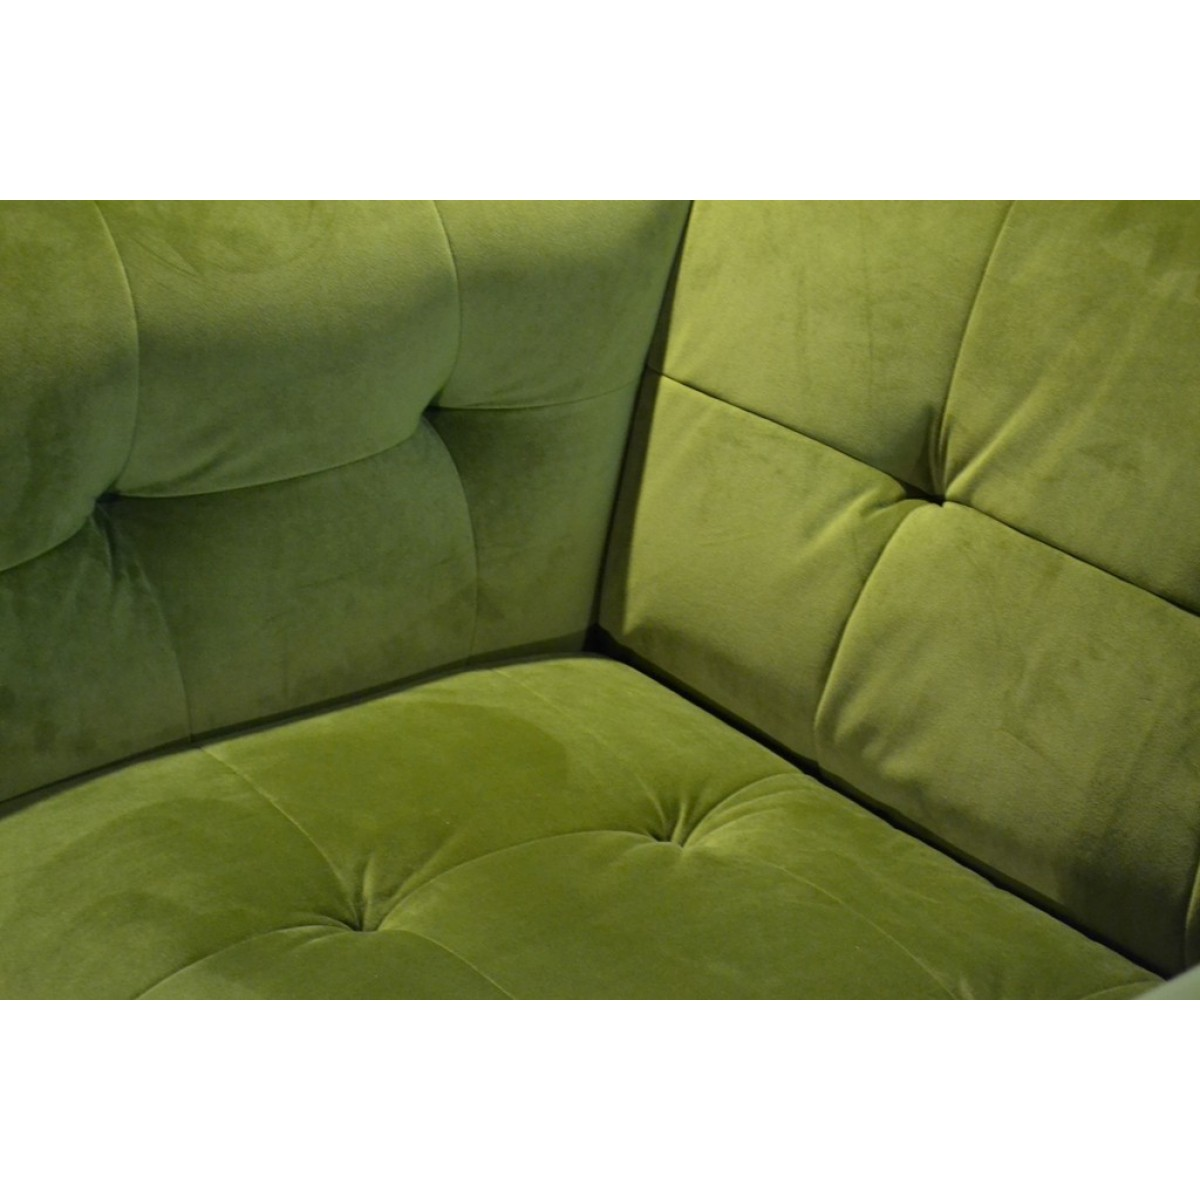 2,5-zits-bank_fauteuil_slimm_jim_patch_stof_seven_cognac_leer_tom_club_easy_sofa_detail